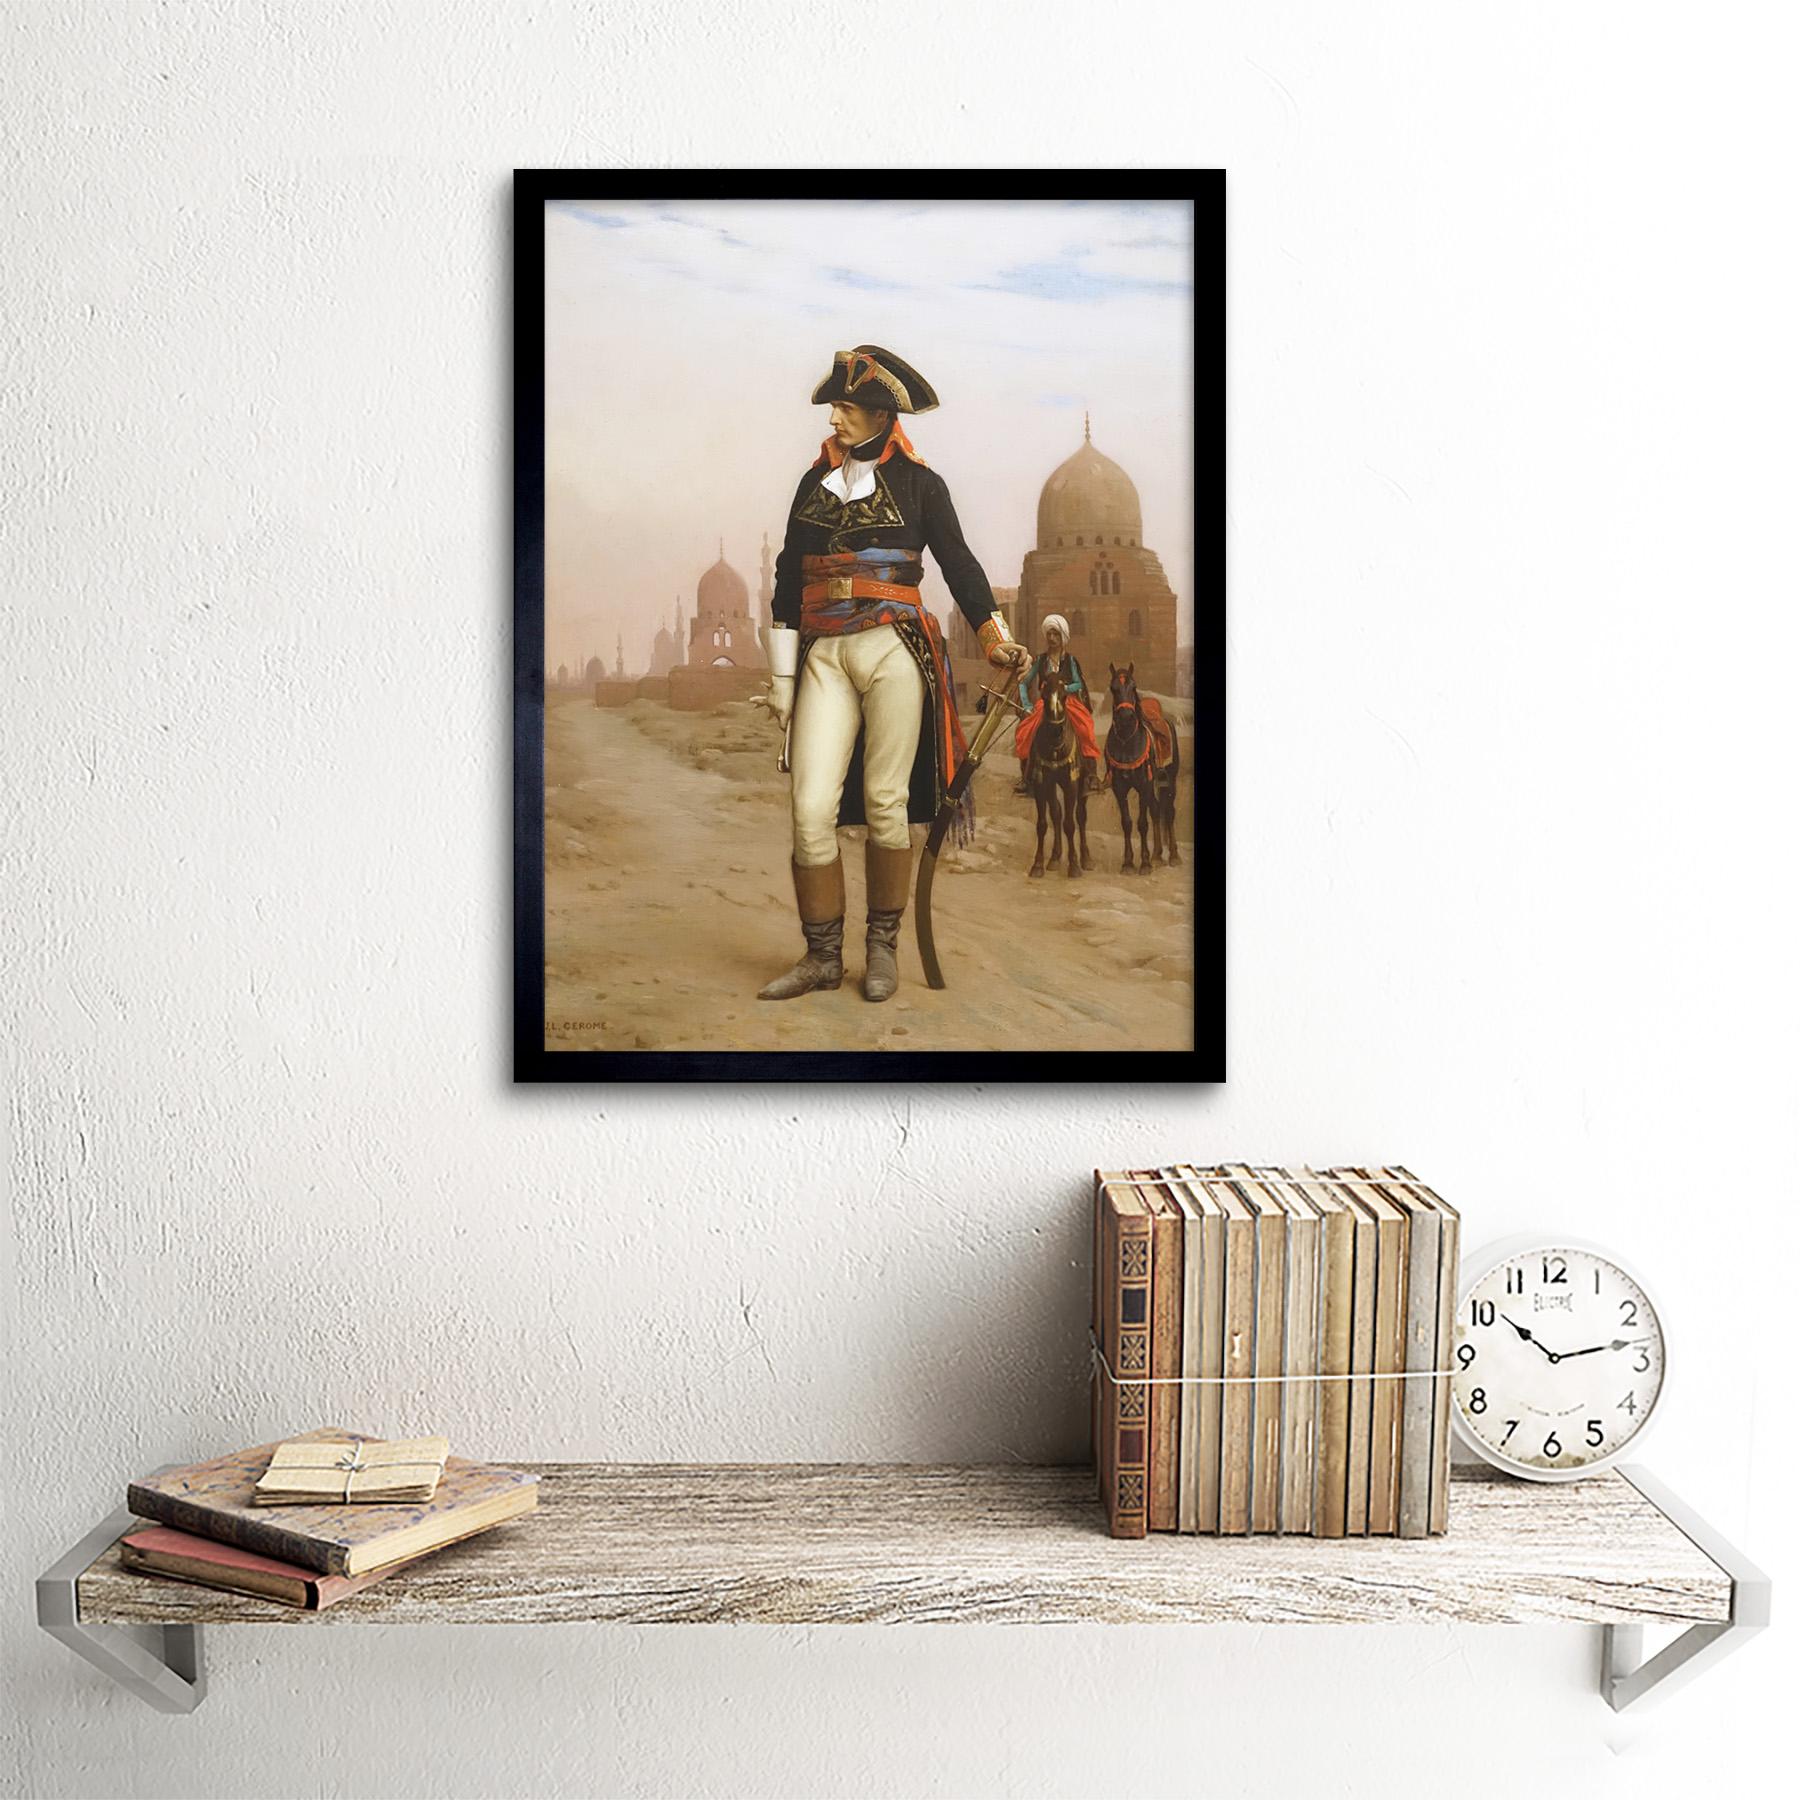 Gerome-Napoleon-Bonaparte-In-Egypt-Painting-Art-Print-Framed-12x16 thumbnail 3